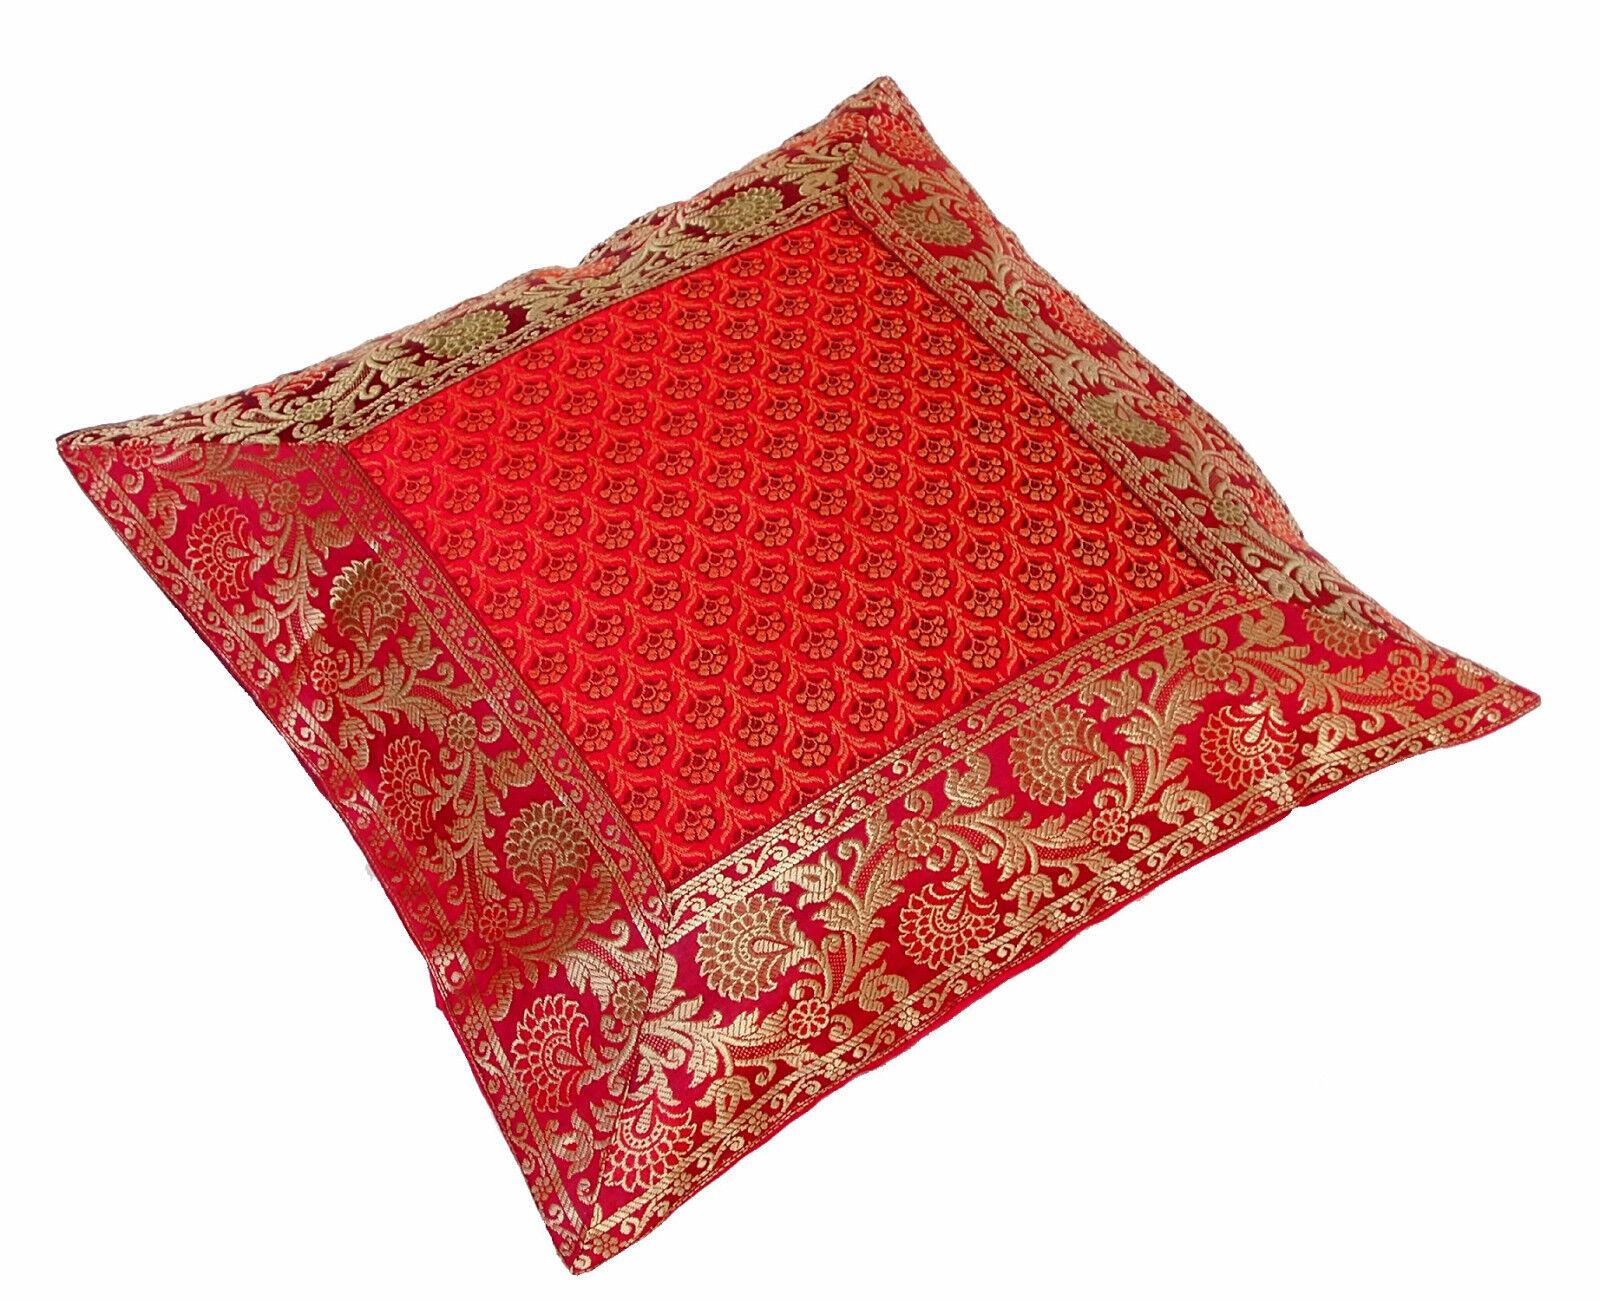 40x40 cm Orientalisch Brokat Kissenbezüg Sitzkissen kissen pillowcase dekokissen